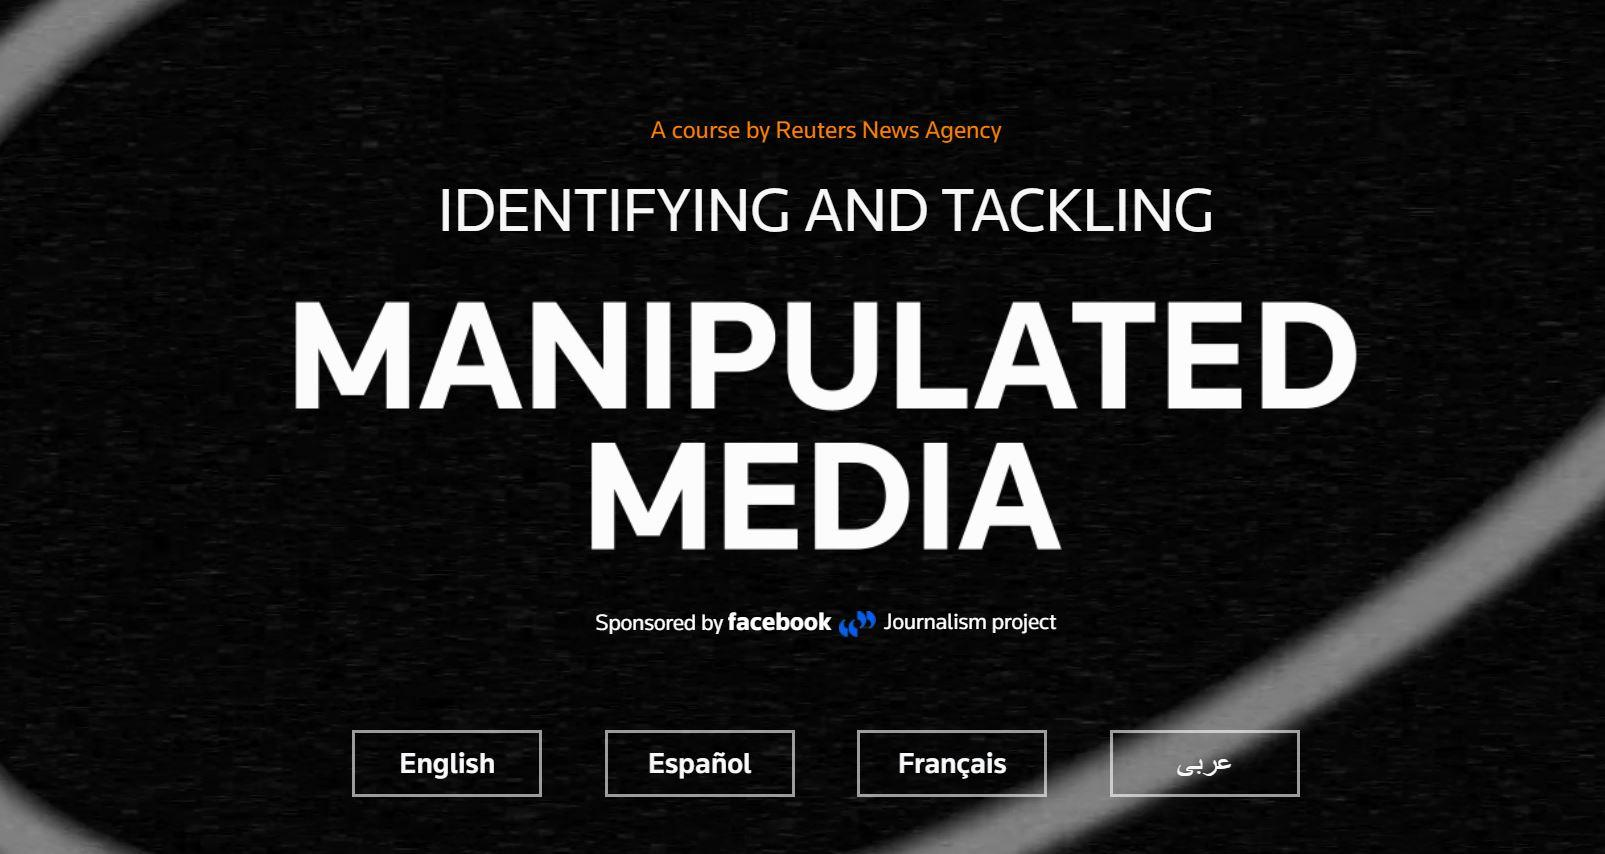 Reuters и Facebook запустили онлайн-курс по борьбе с фейками